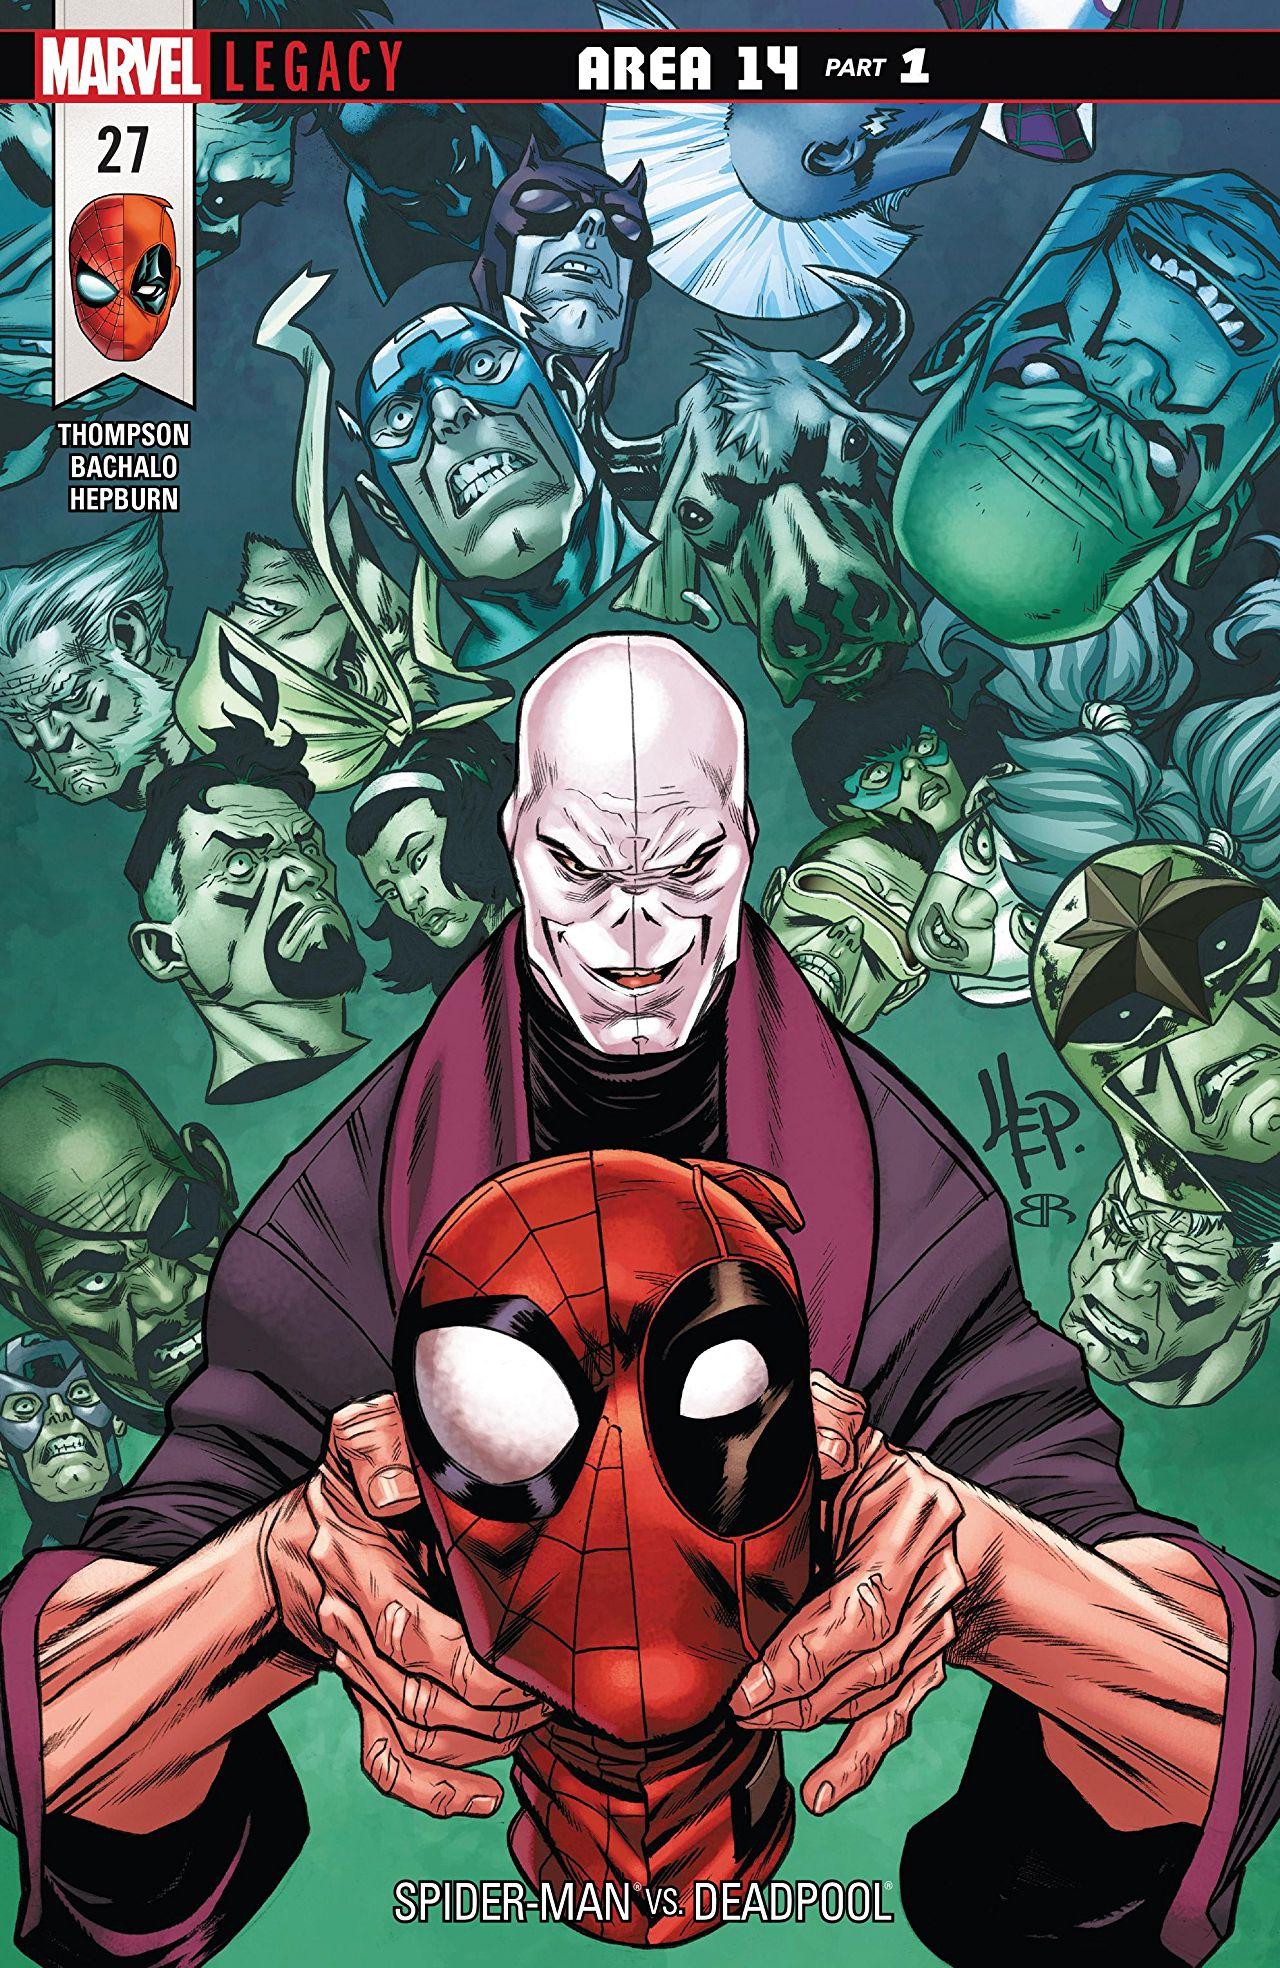 Spider-Man / Deadpool 27 - Arms Race Part 4